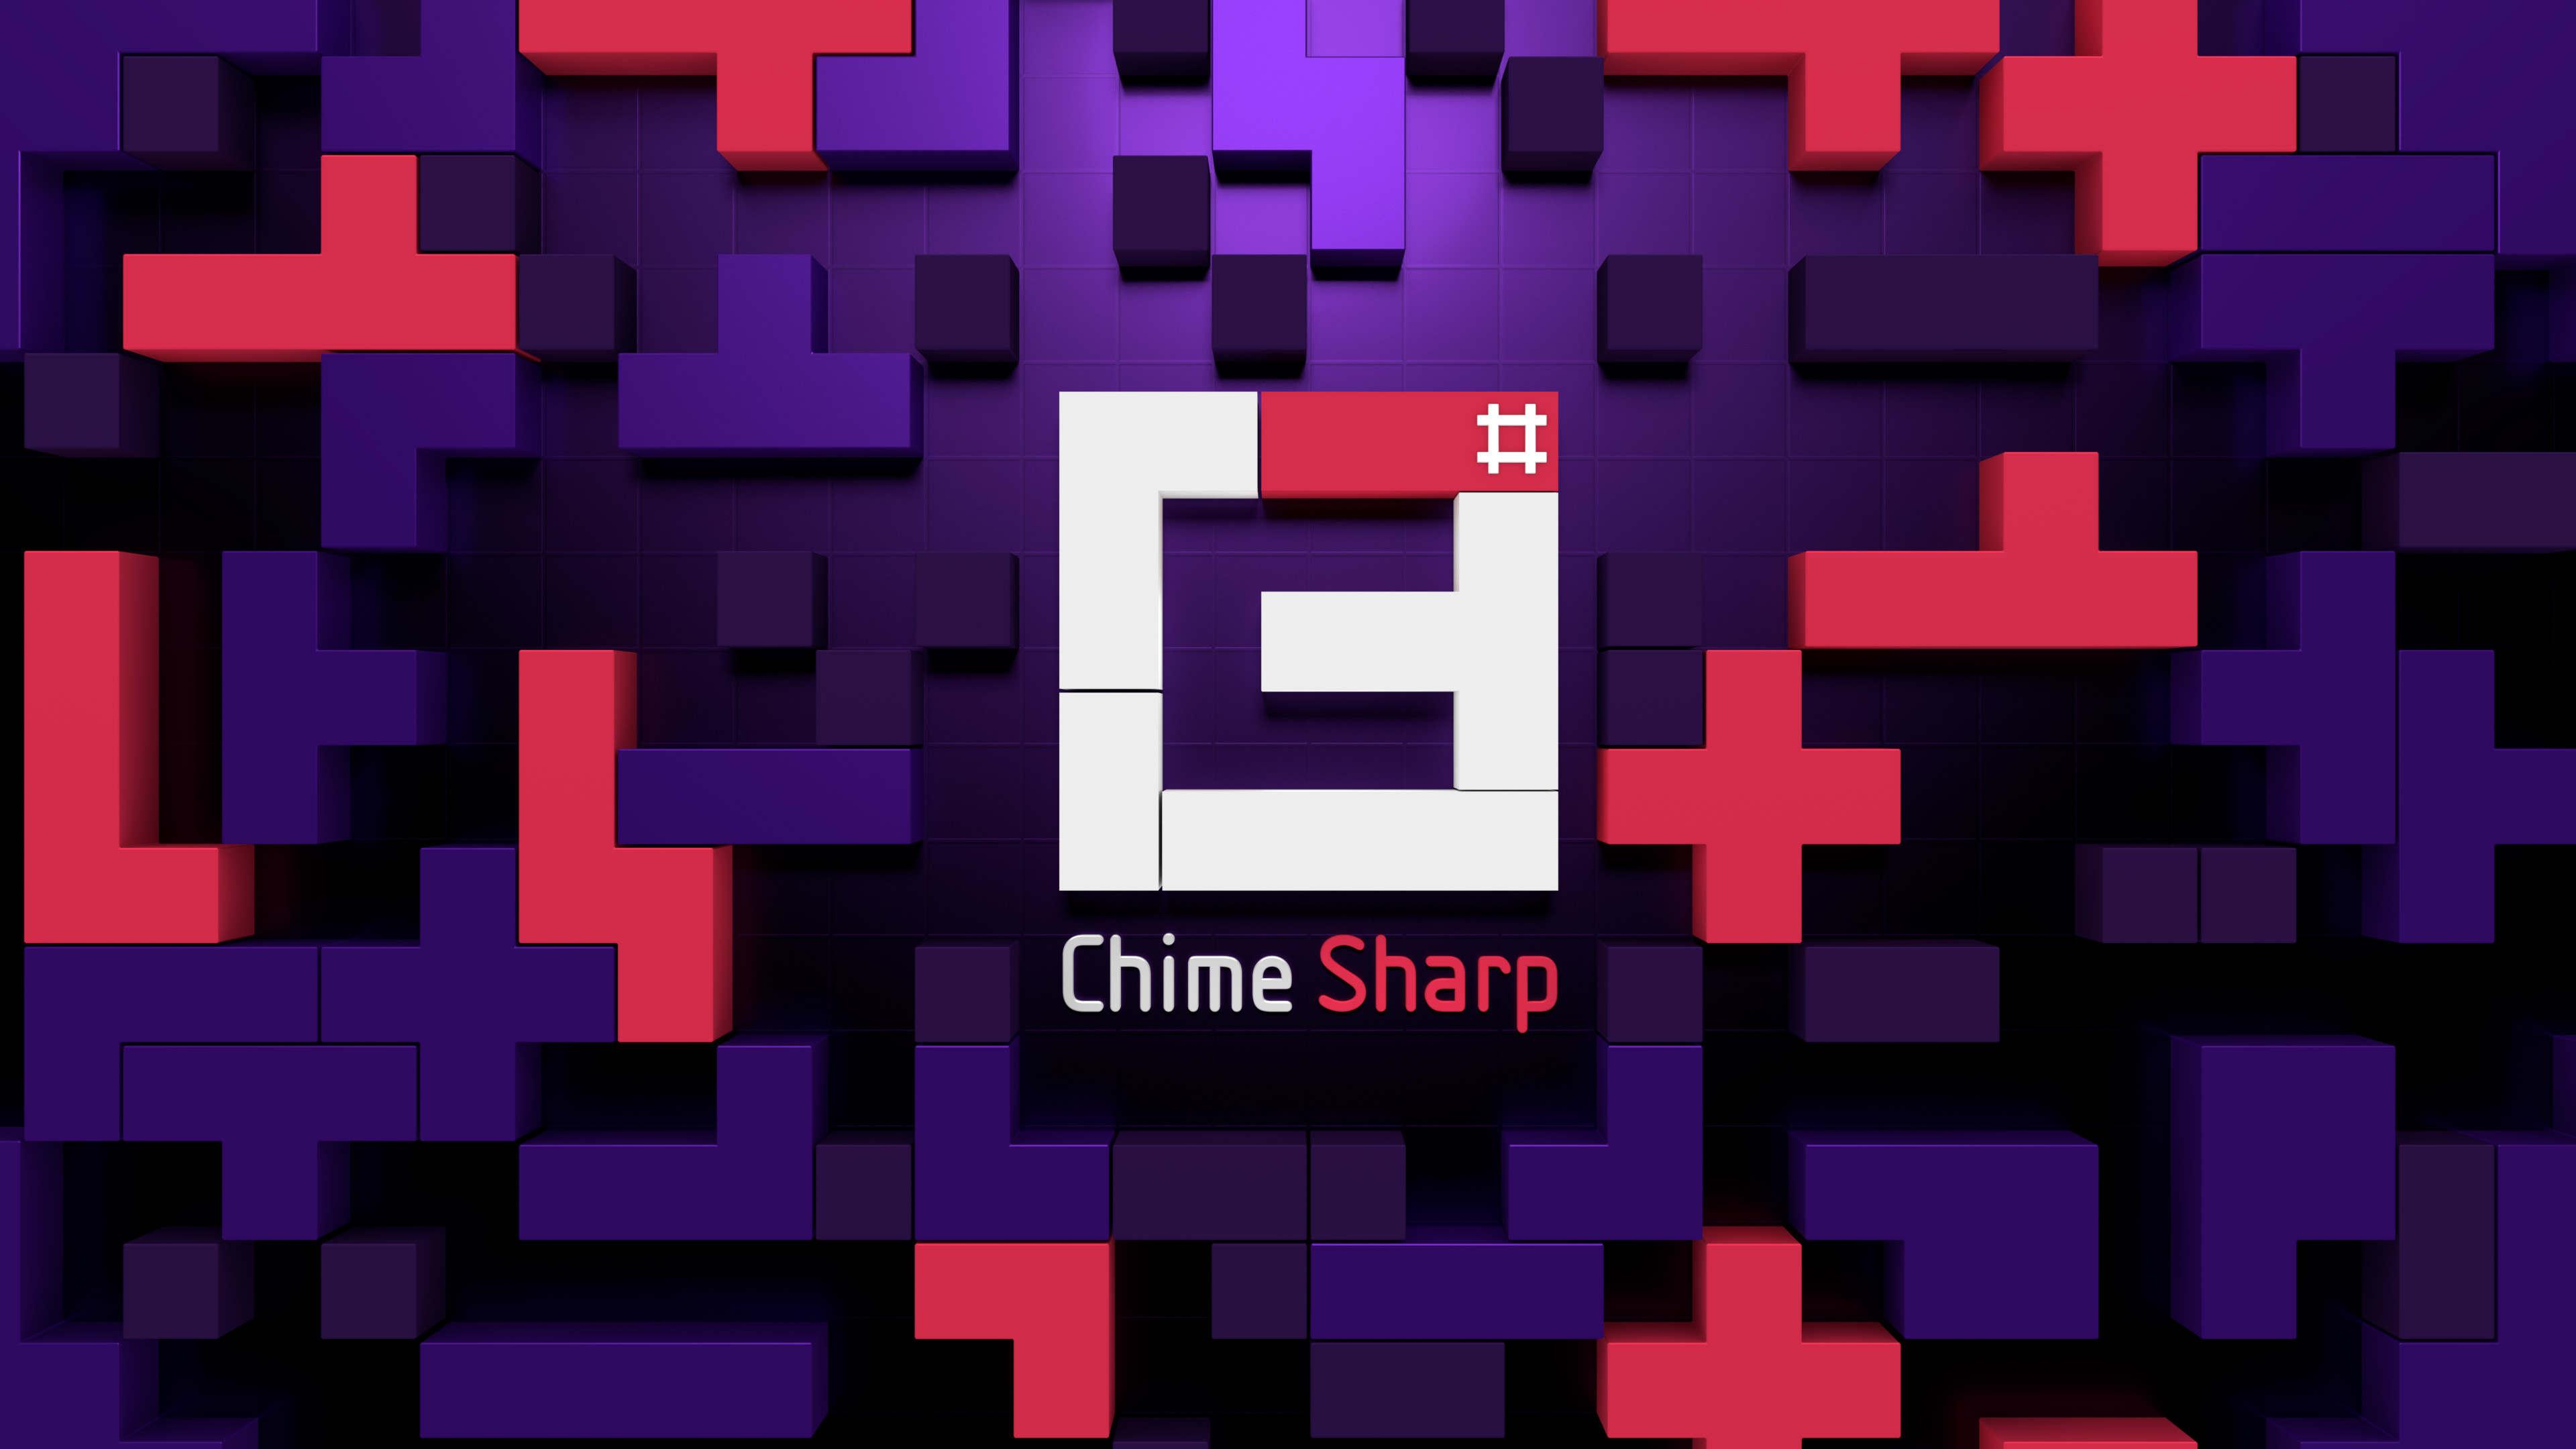 Chime Sharp - Xbox One